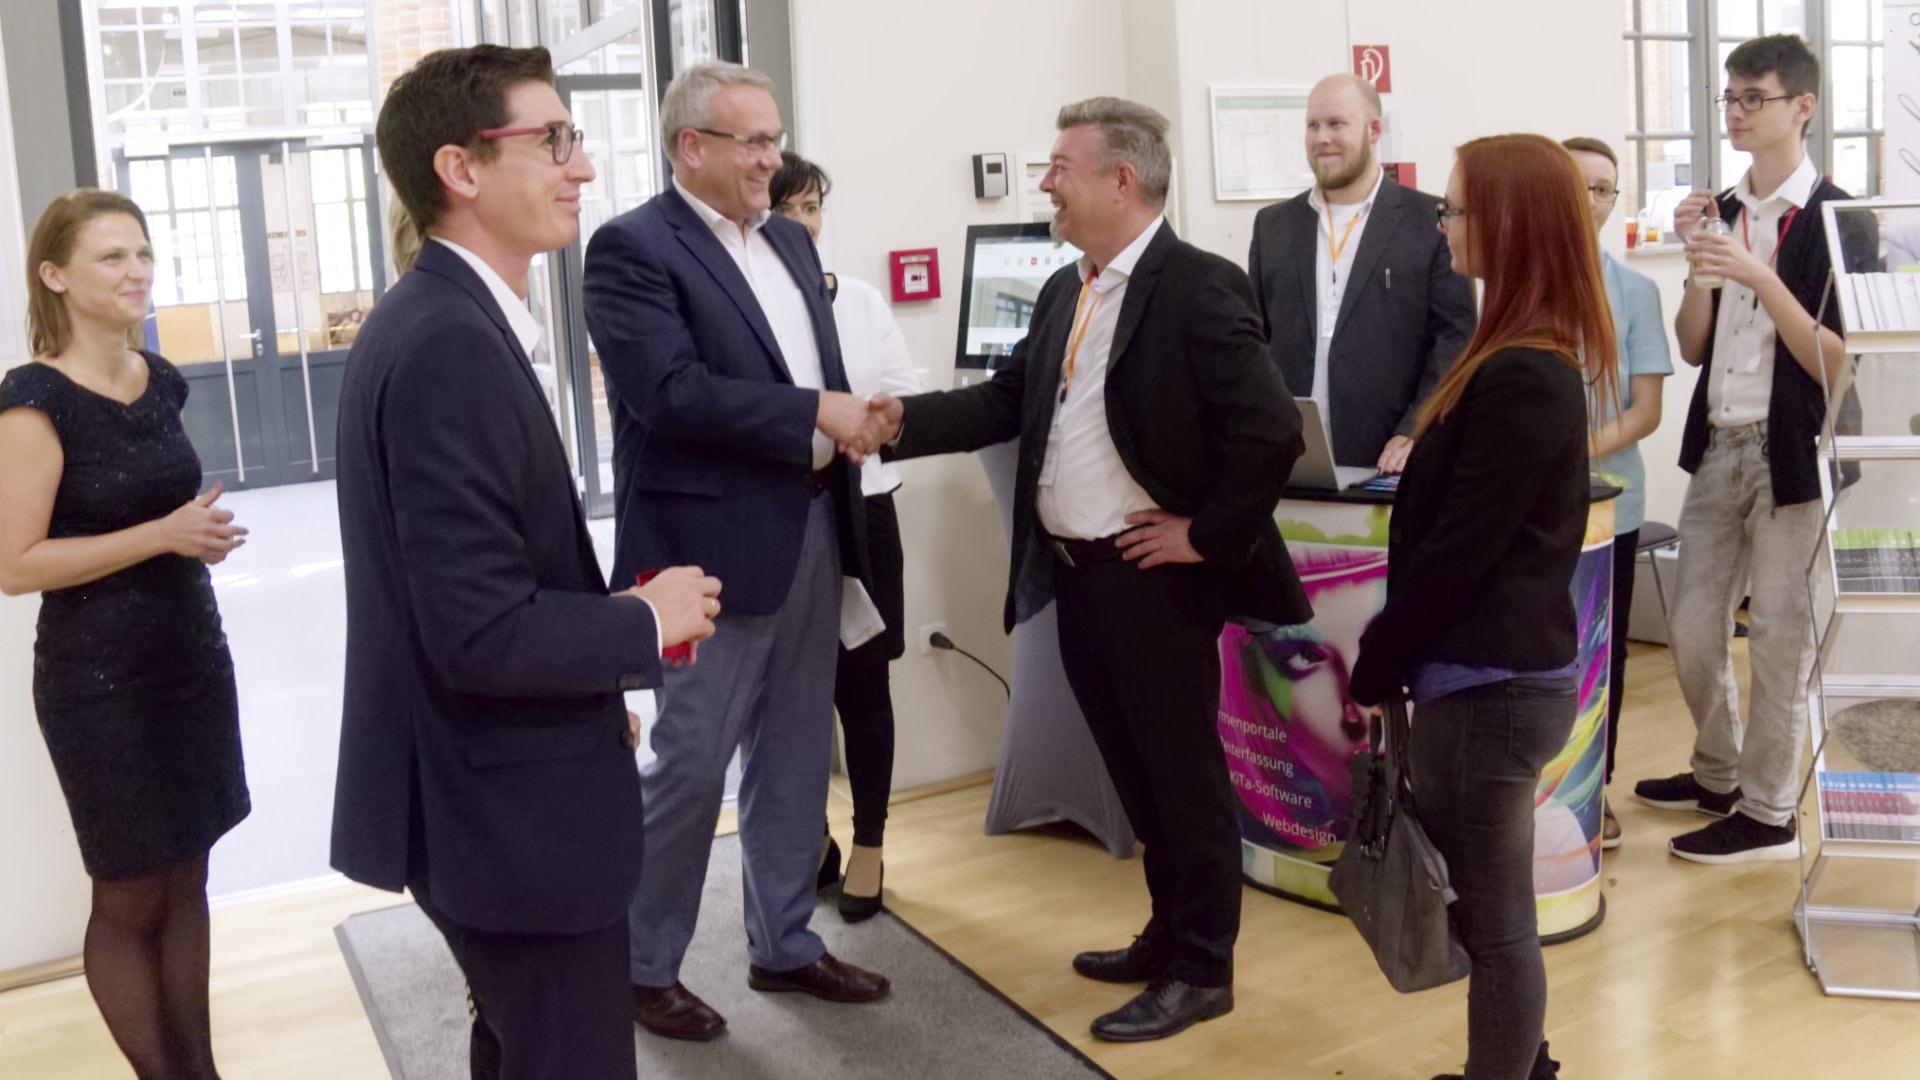 WUNDS Digitaltag 2018 - Landrat Götz Ulrich